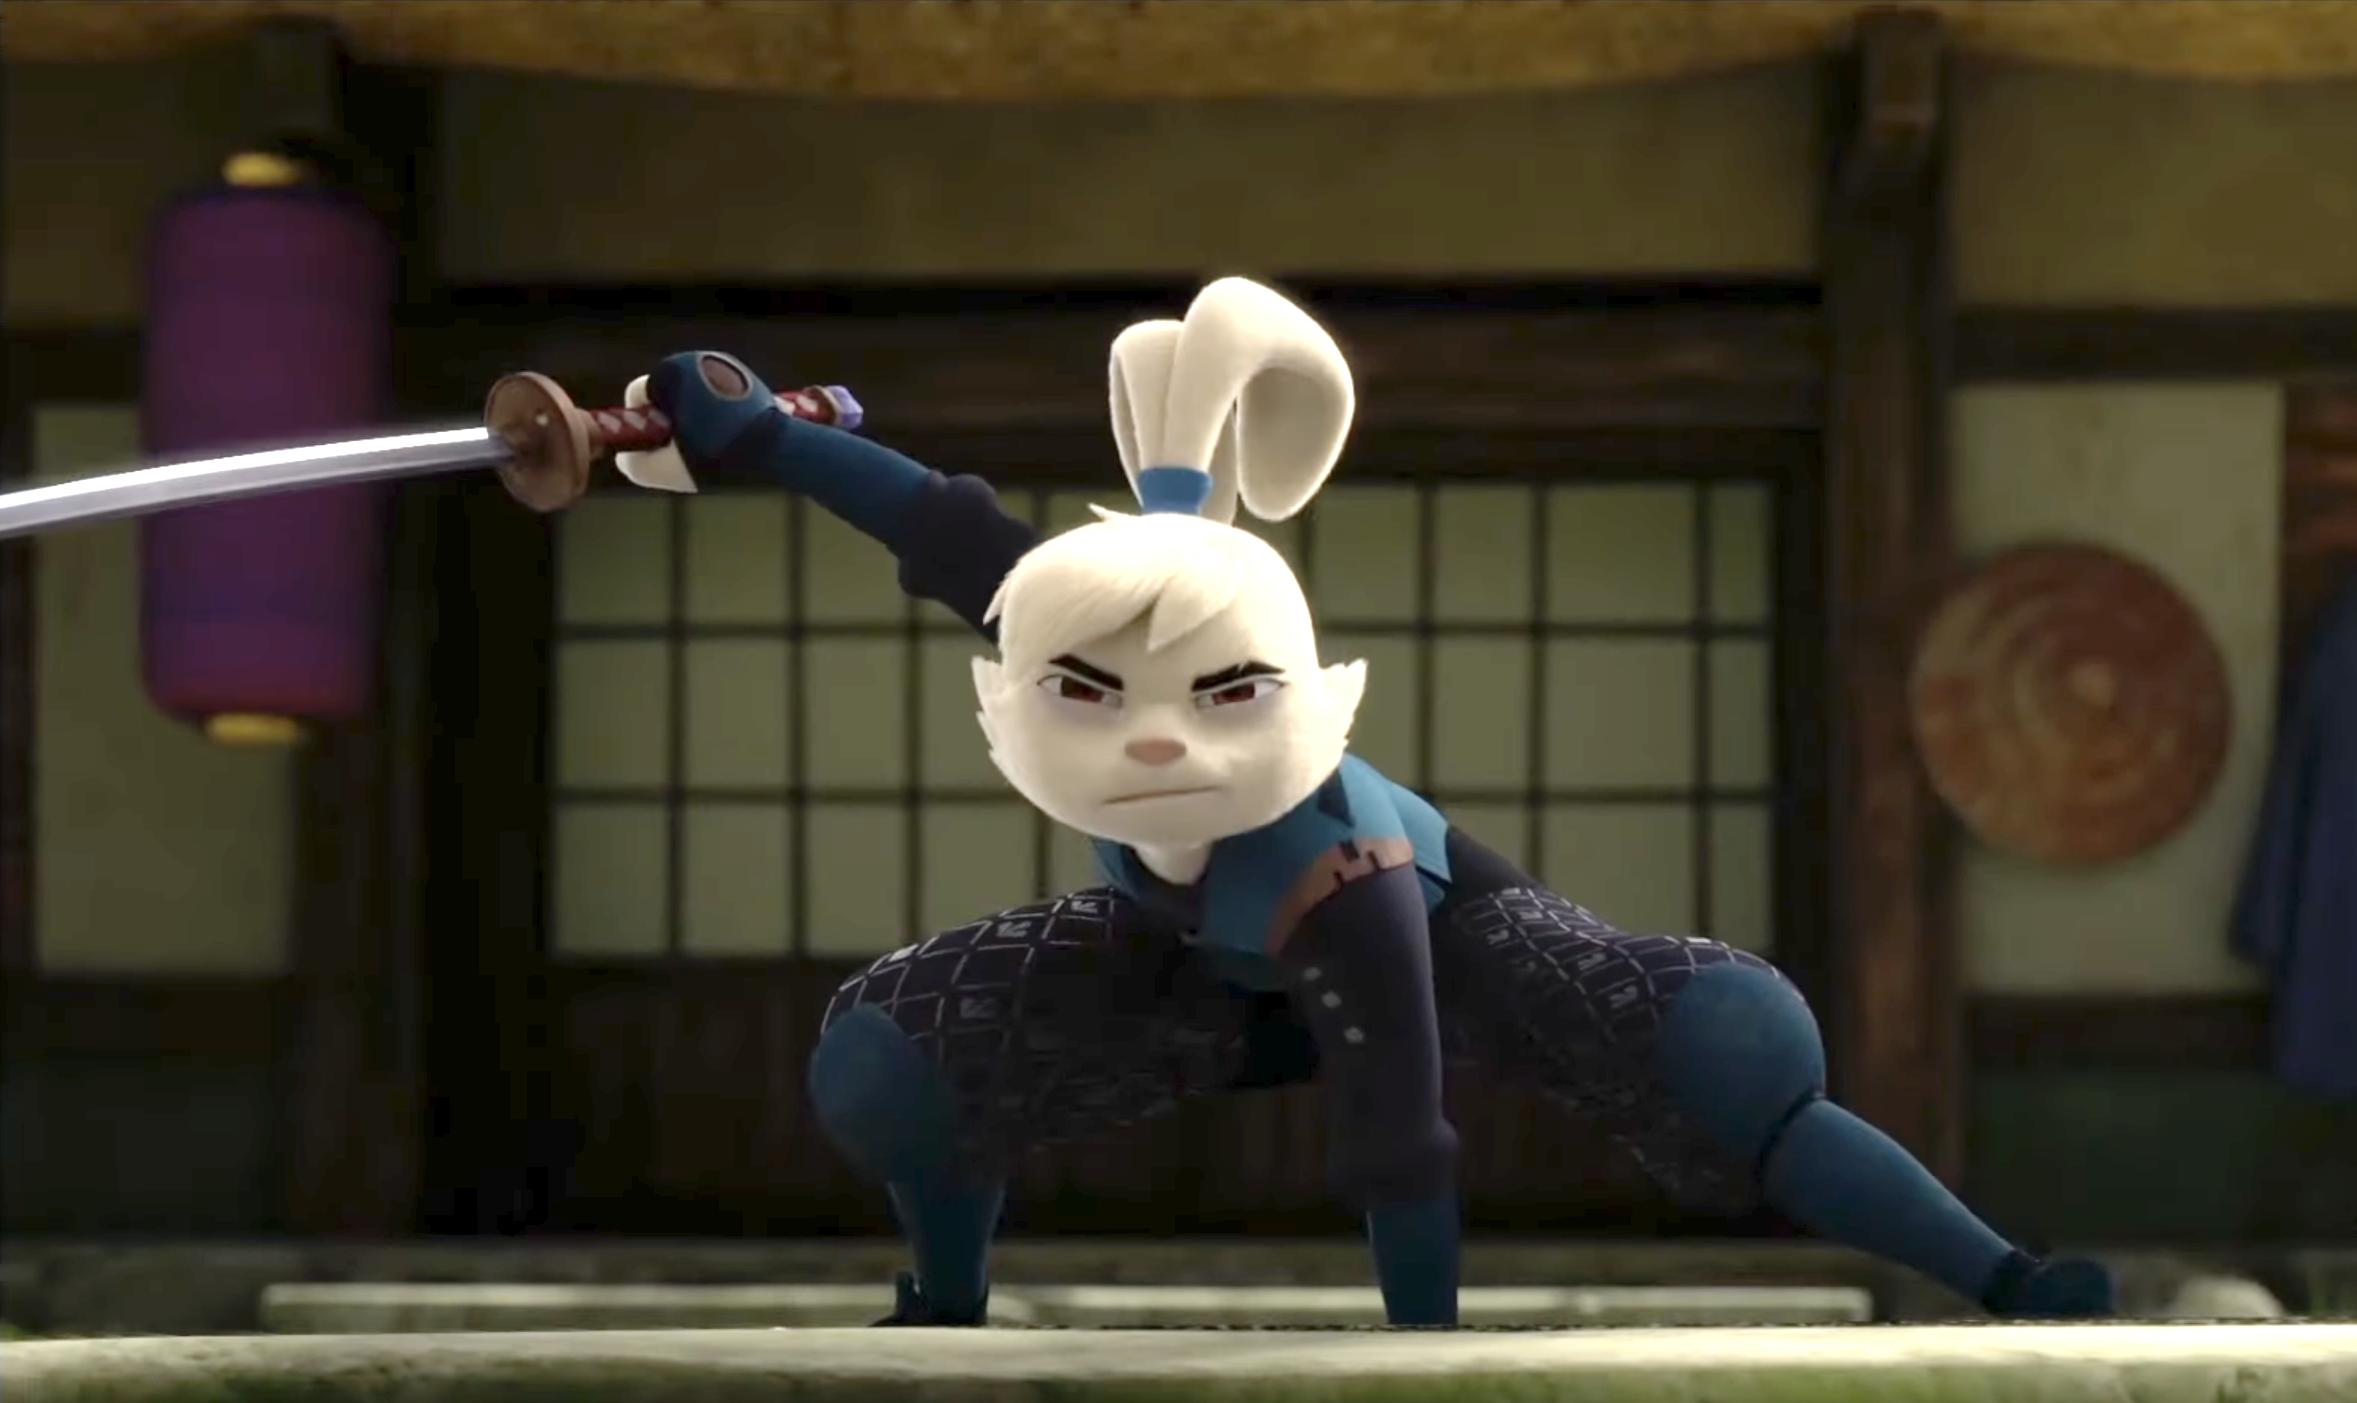 Yuichi Usagi, an anthropomorphic rabbit samurai, the hero of Samurai Rabbit: The Usagi Chronicles.